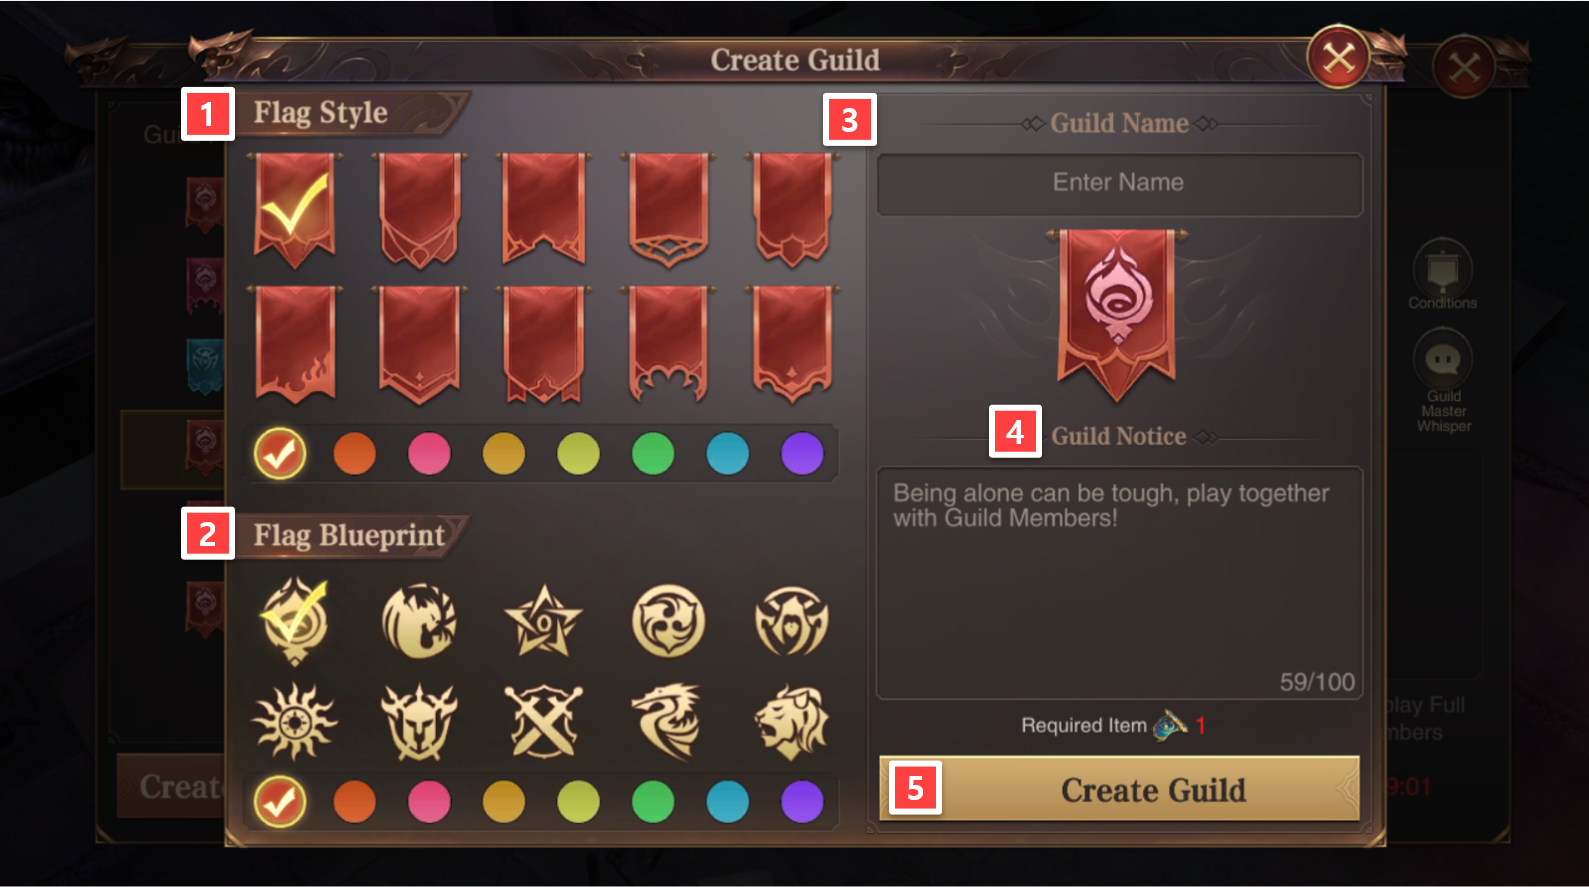 Guild Creation